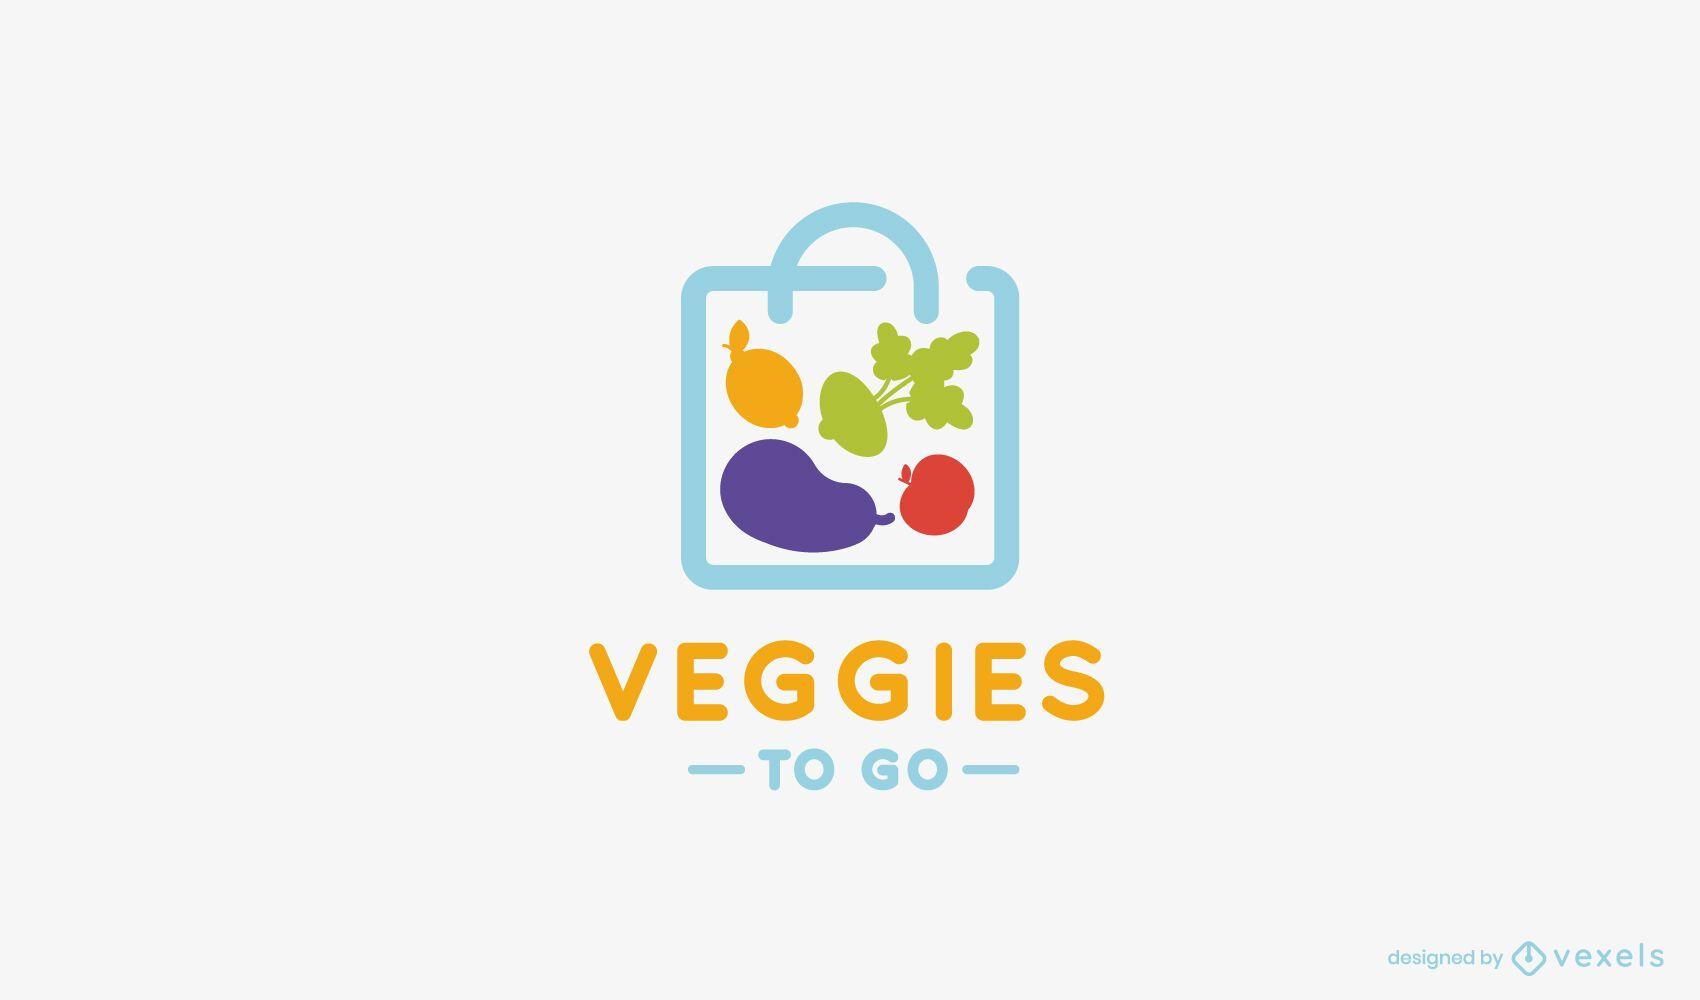 Veggies to Go Plantilla de logotipo